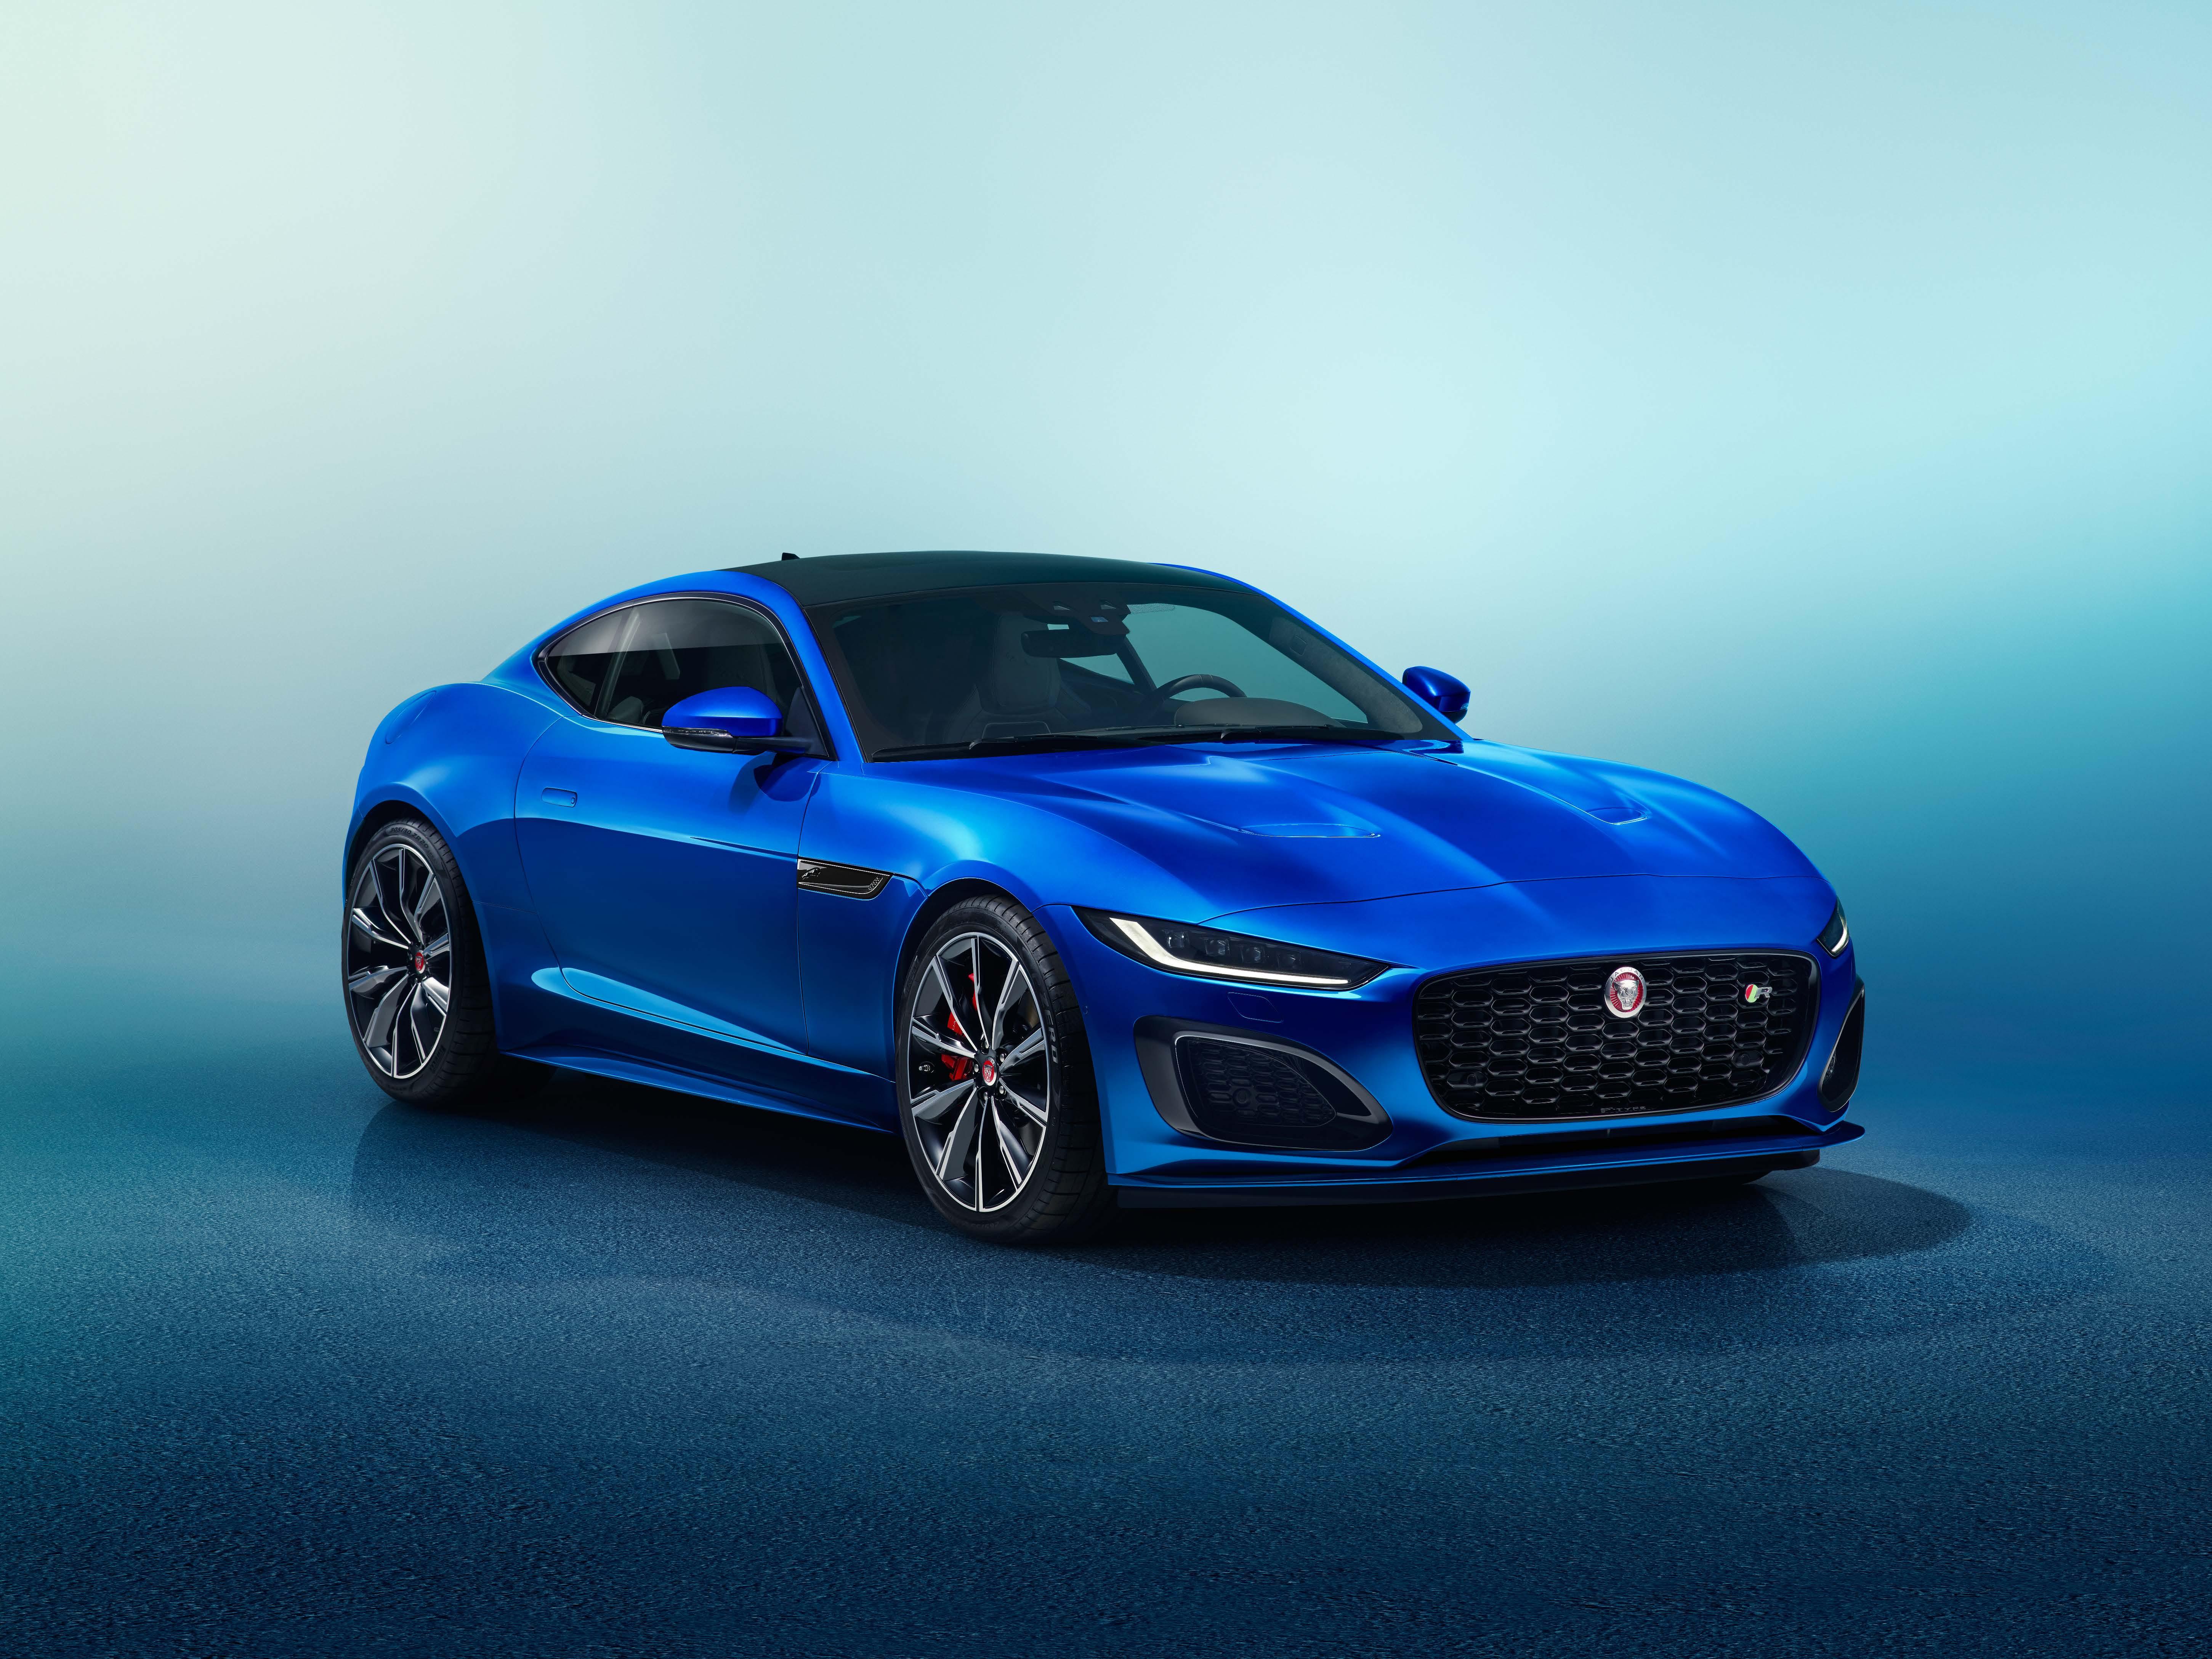 Der neue Jaguar F-Type